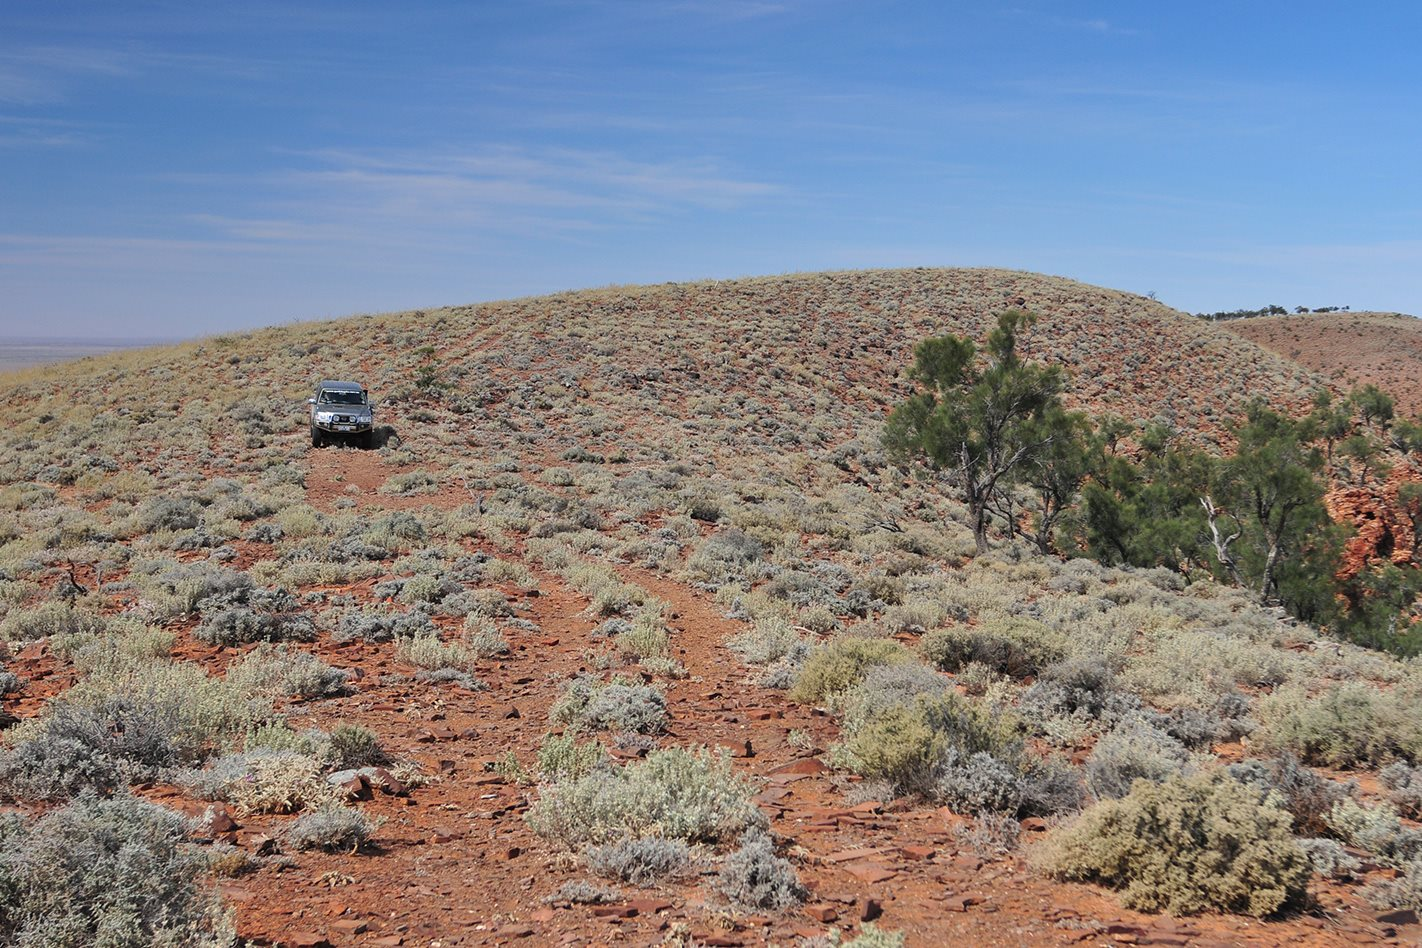 Mt-Deception-4WD-track,-Flinders-Ranges.jpg